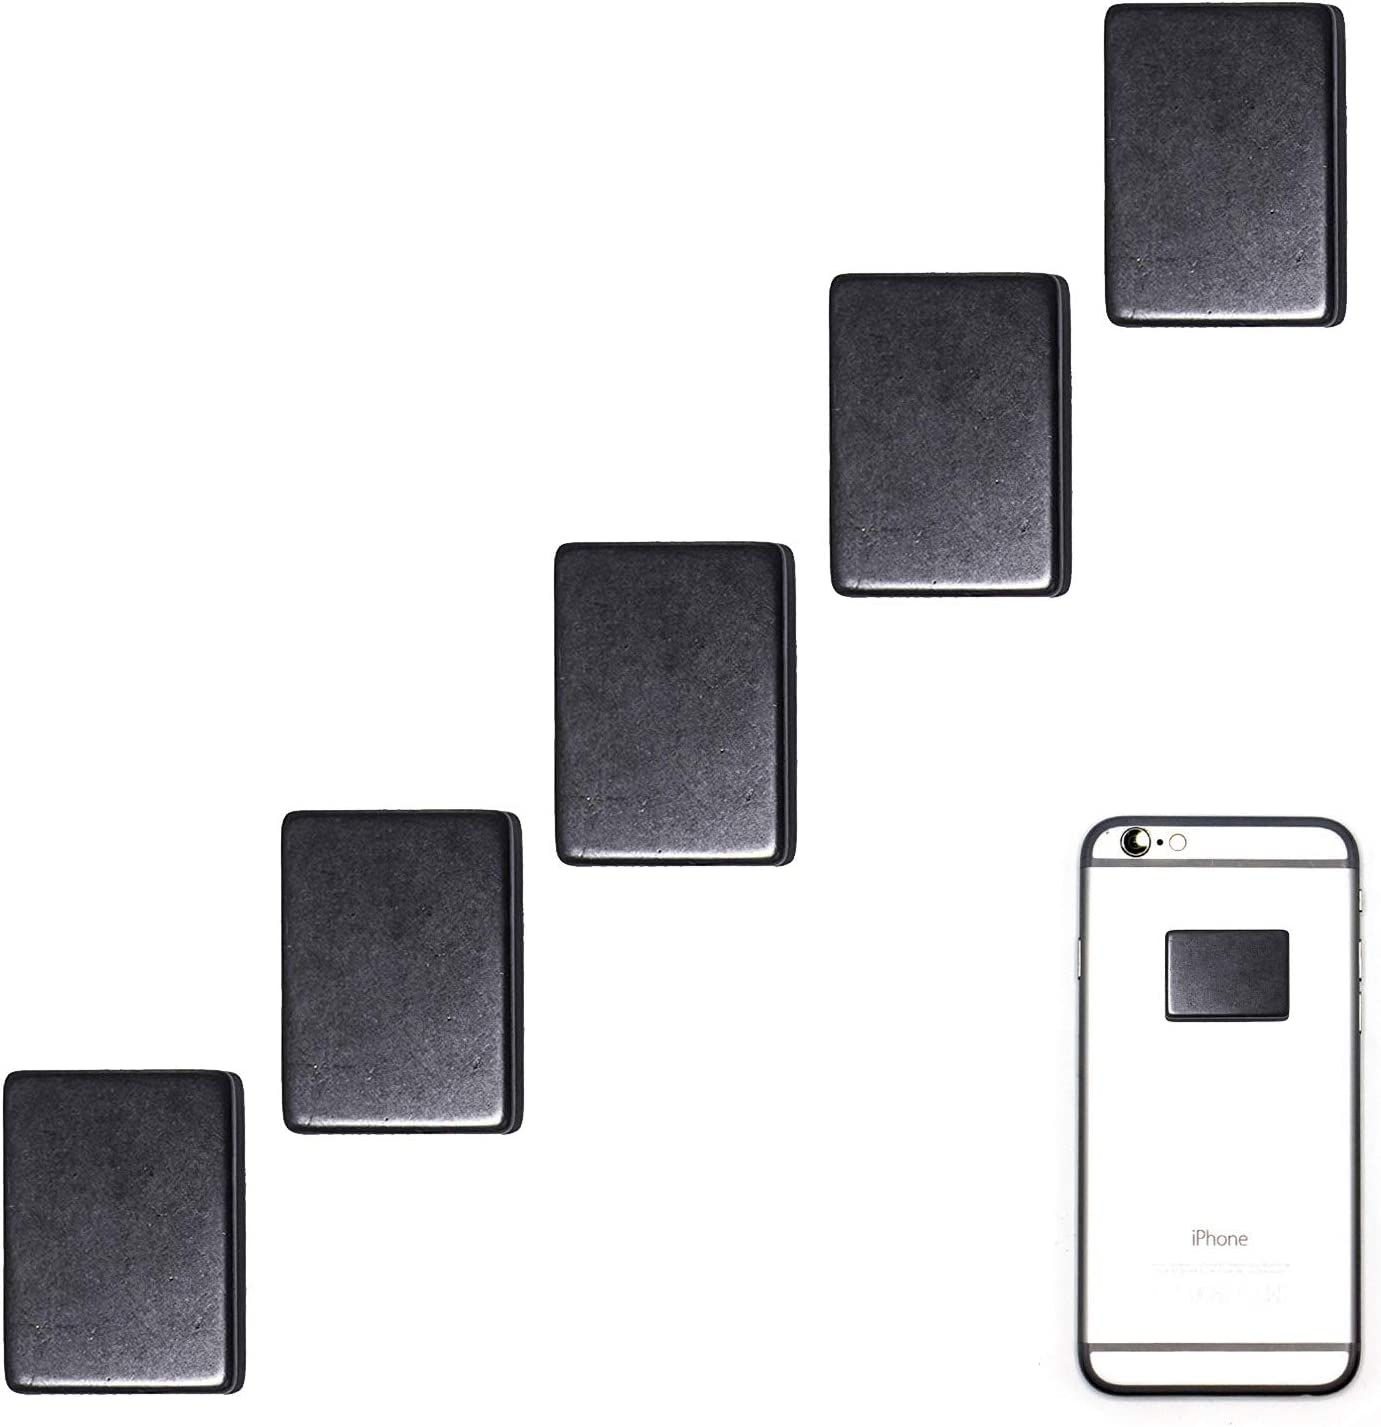 Radiation Protection for Cellphones/Laptop - Anti EMF/EMR Radiation Sticker - Radiation Shield Blocker - Set of 5 Polished Shungite Plate Sticker for Mobile Phone - Shungite Stickers for Cell Phone